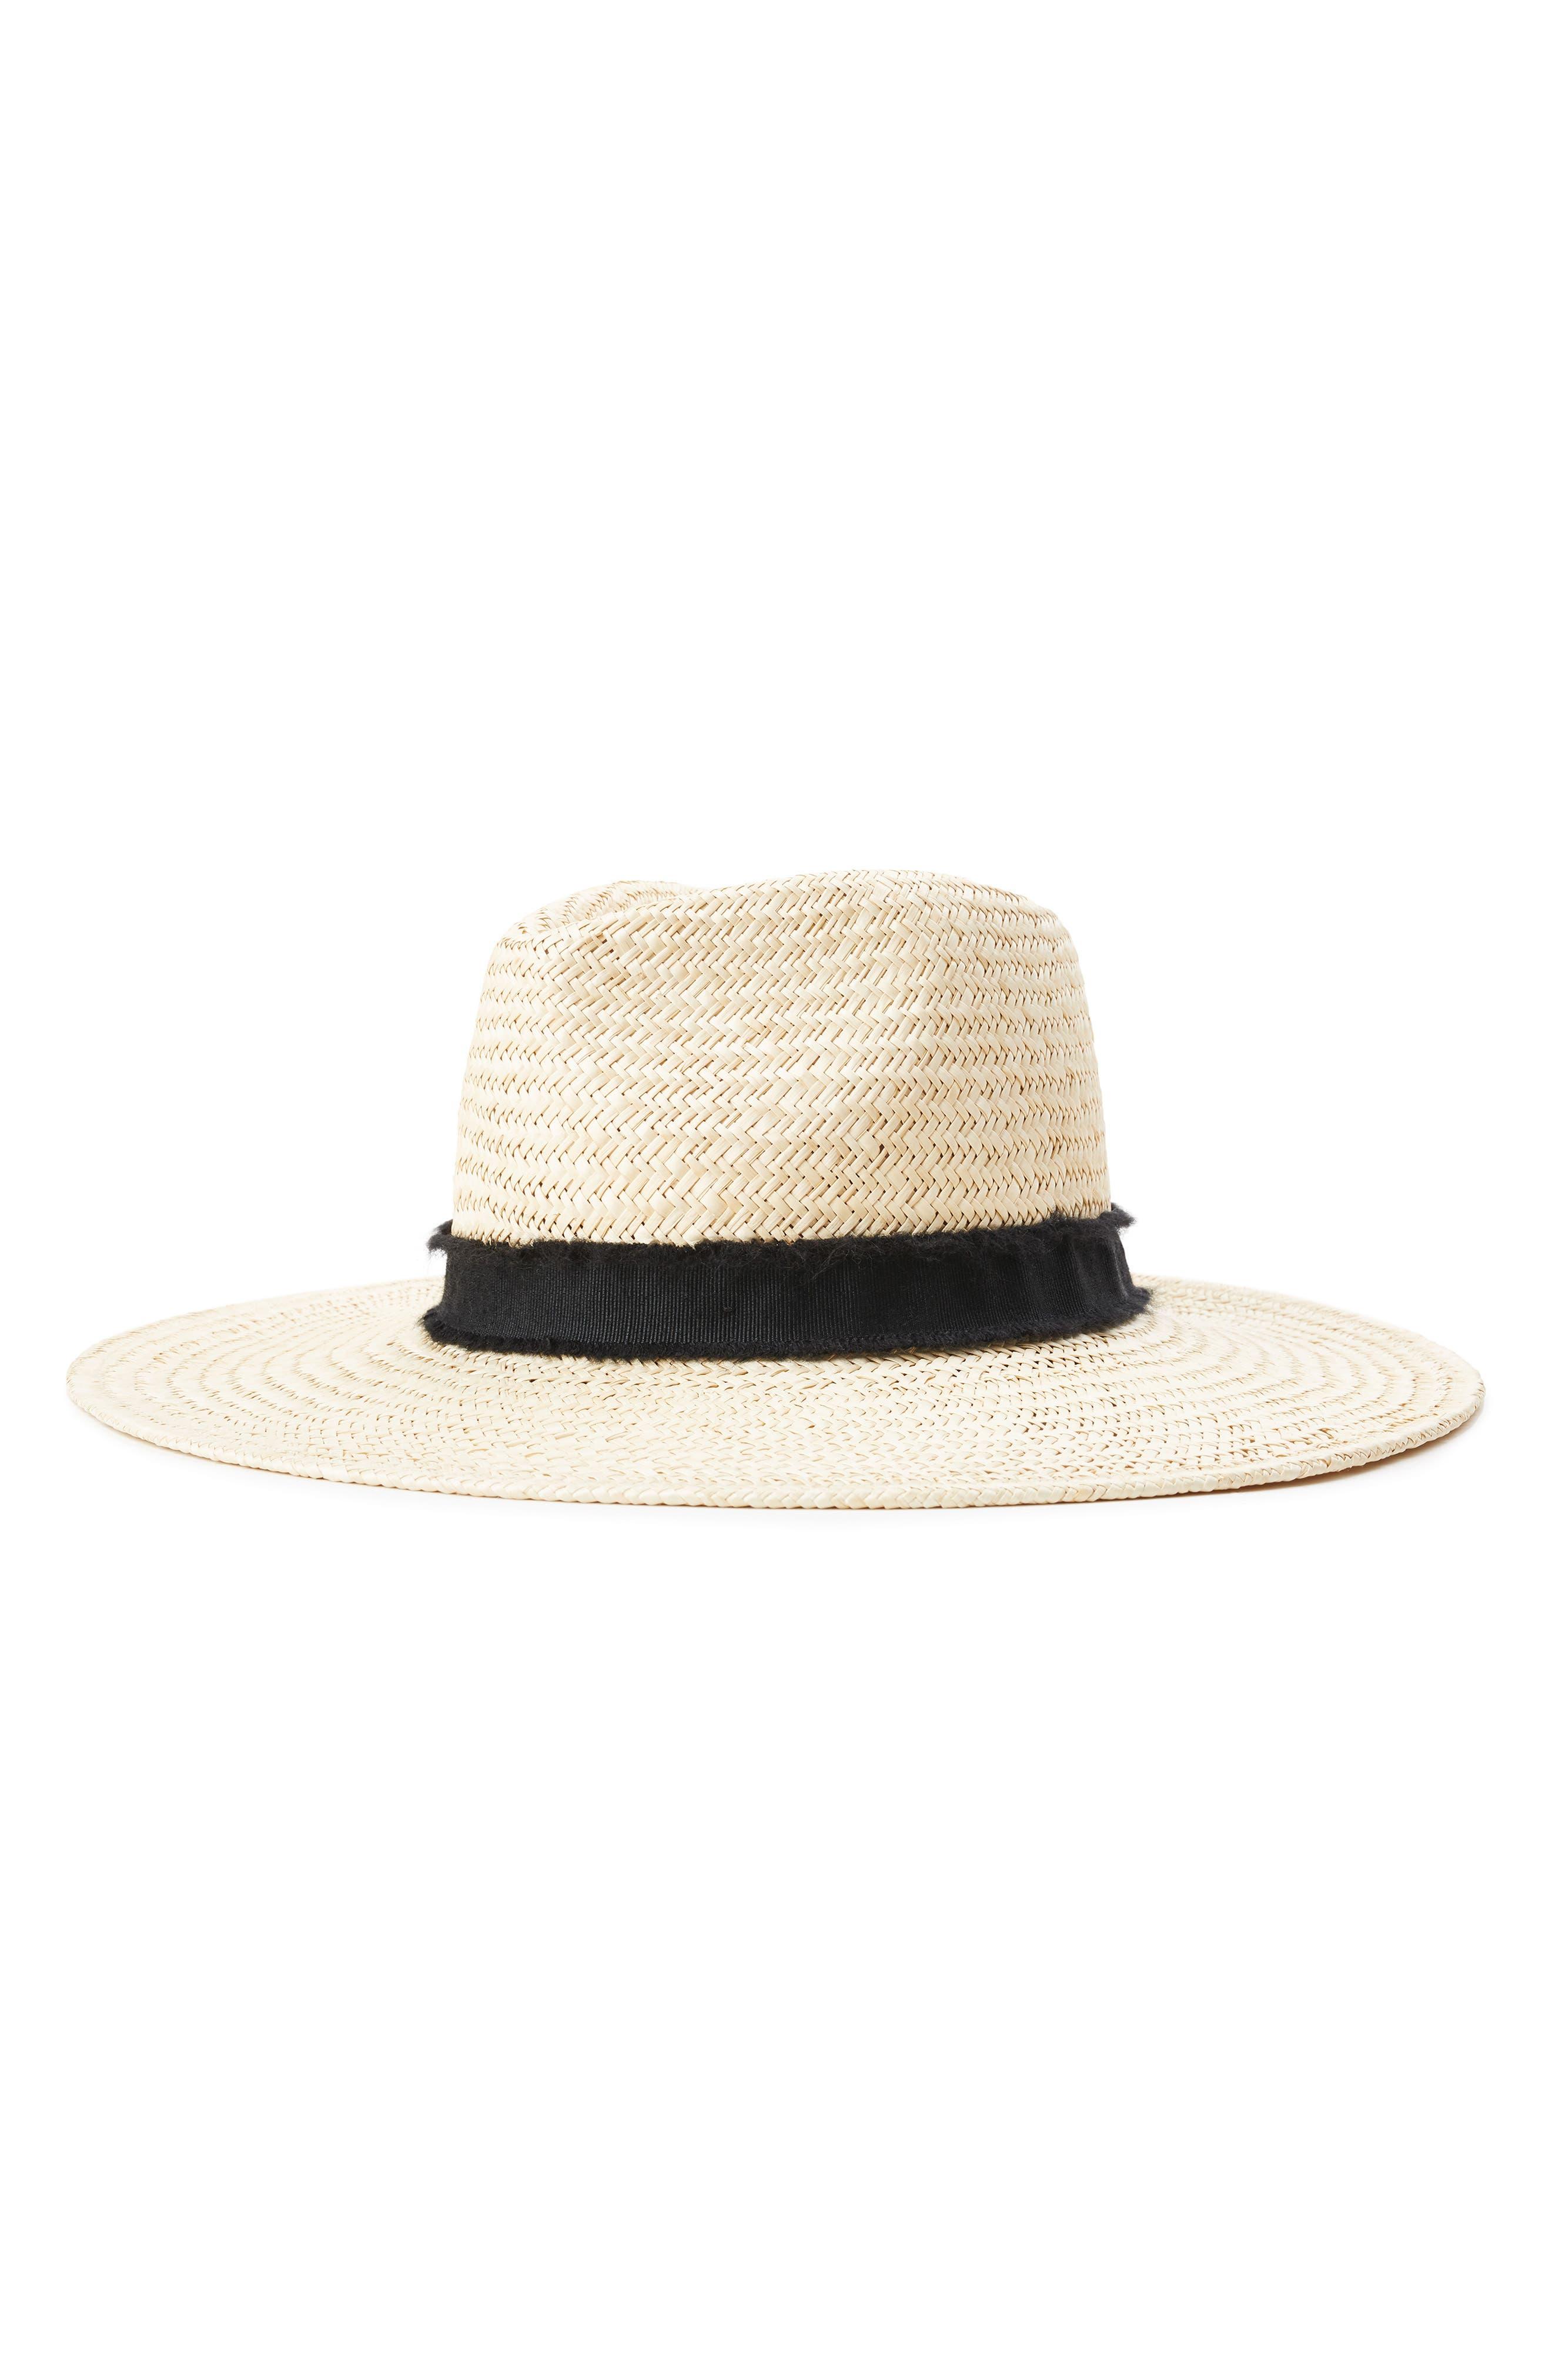 BRIXTON Joanna II Straw Hat, Main, color, TAN/ BLACK